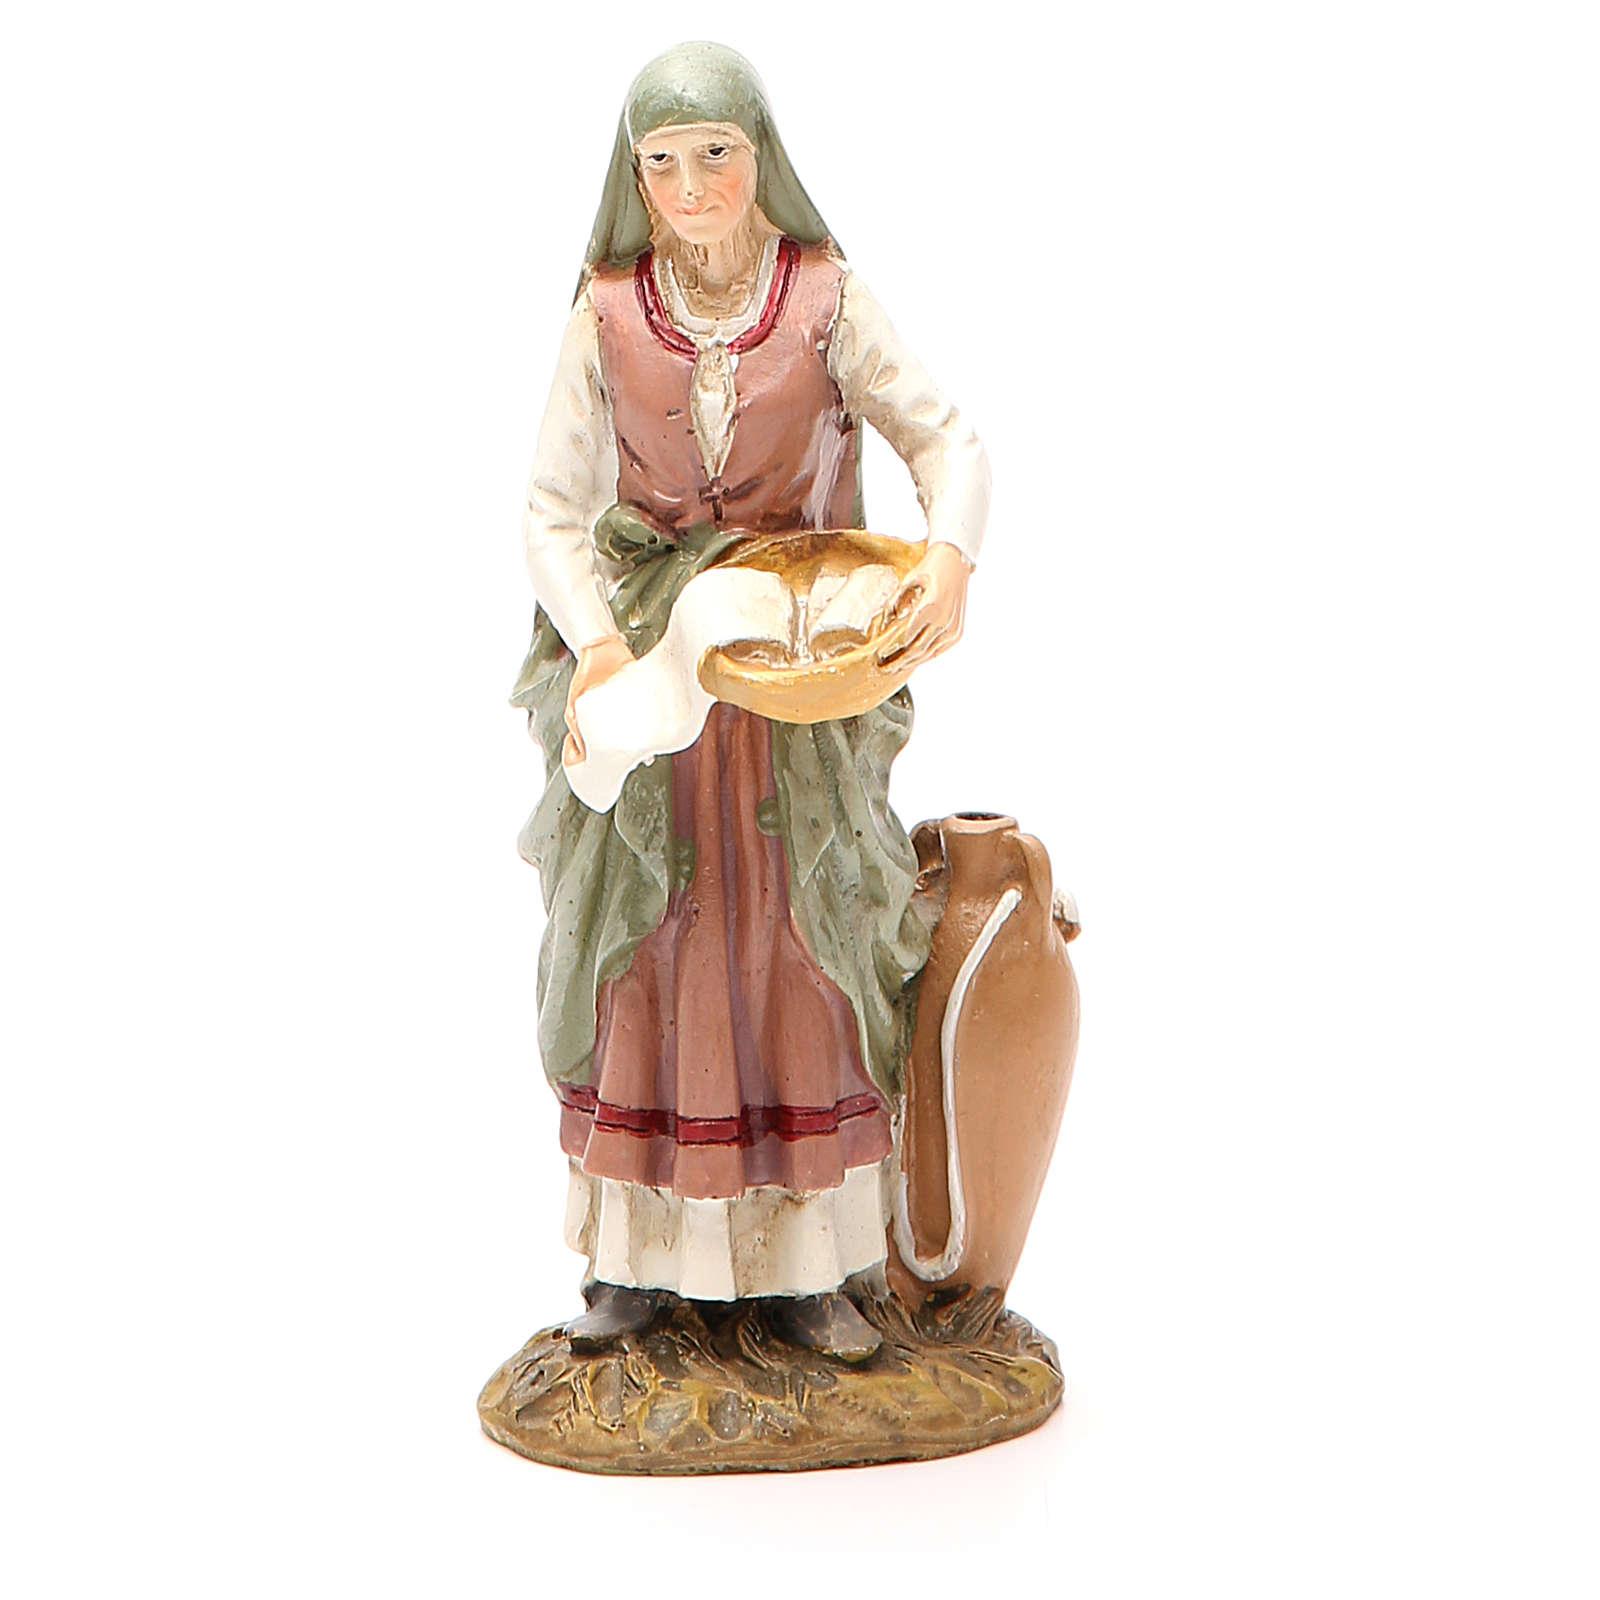 Sage-femme résine peinte 16 cm gamme Martino Landi 3